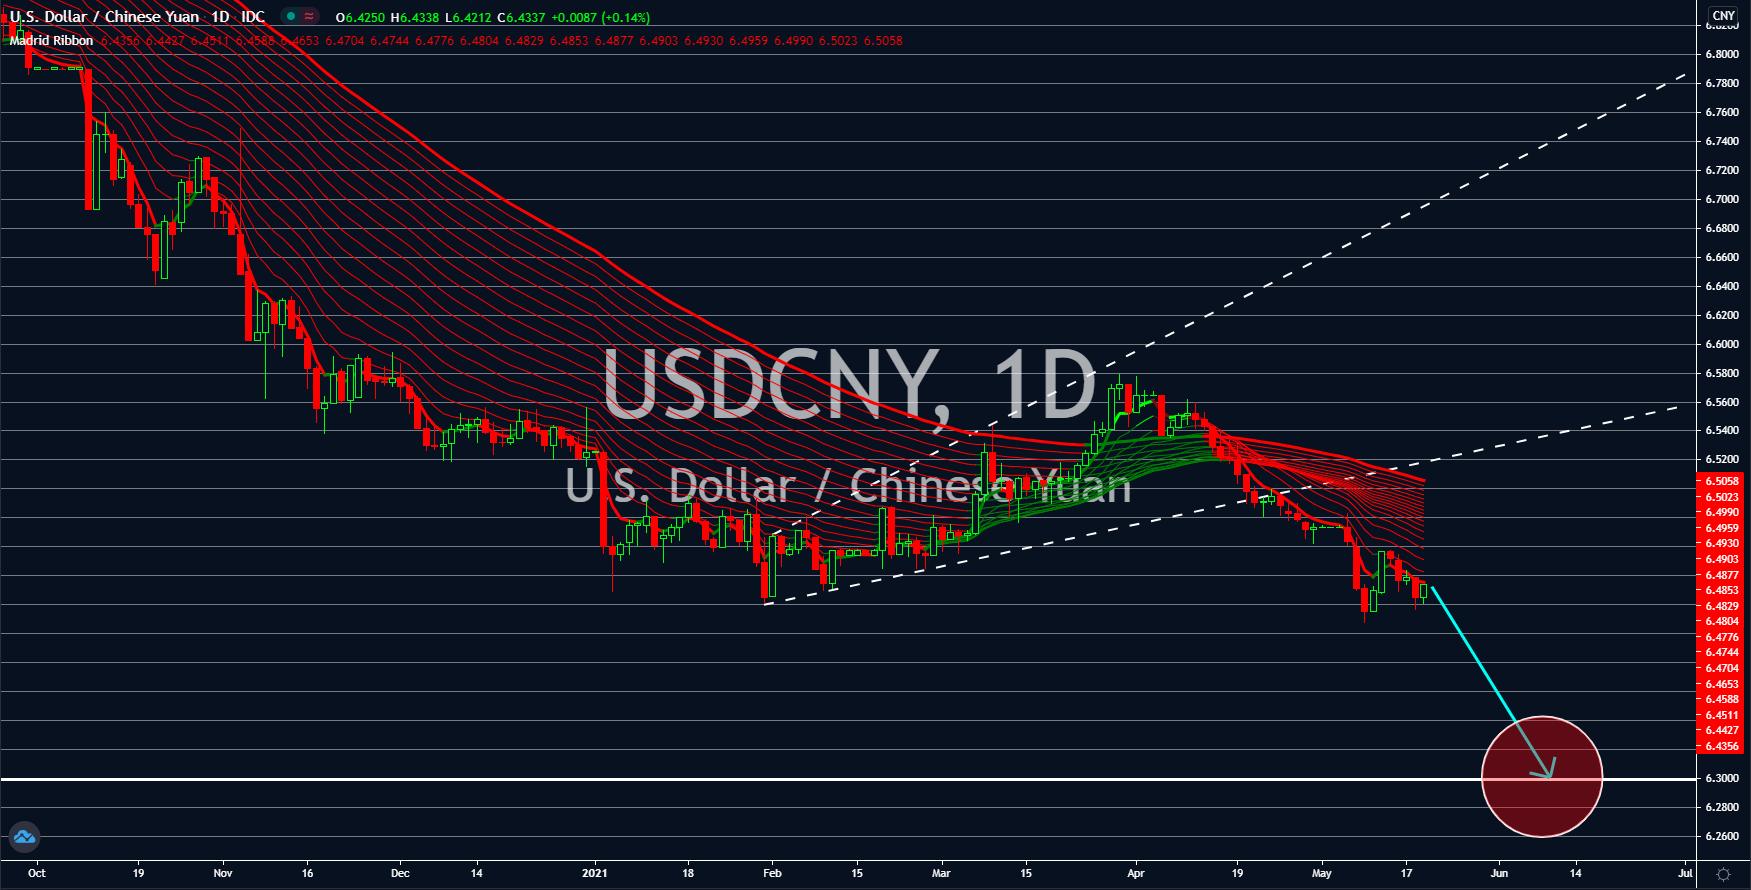 USDCNY